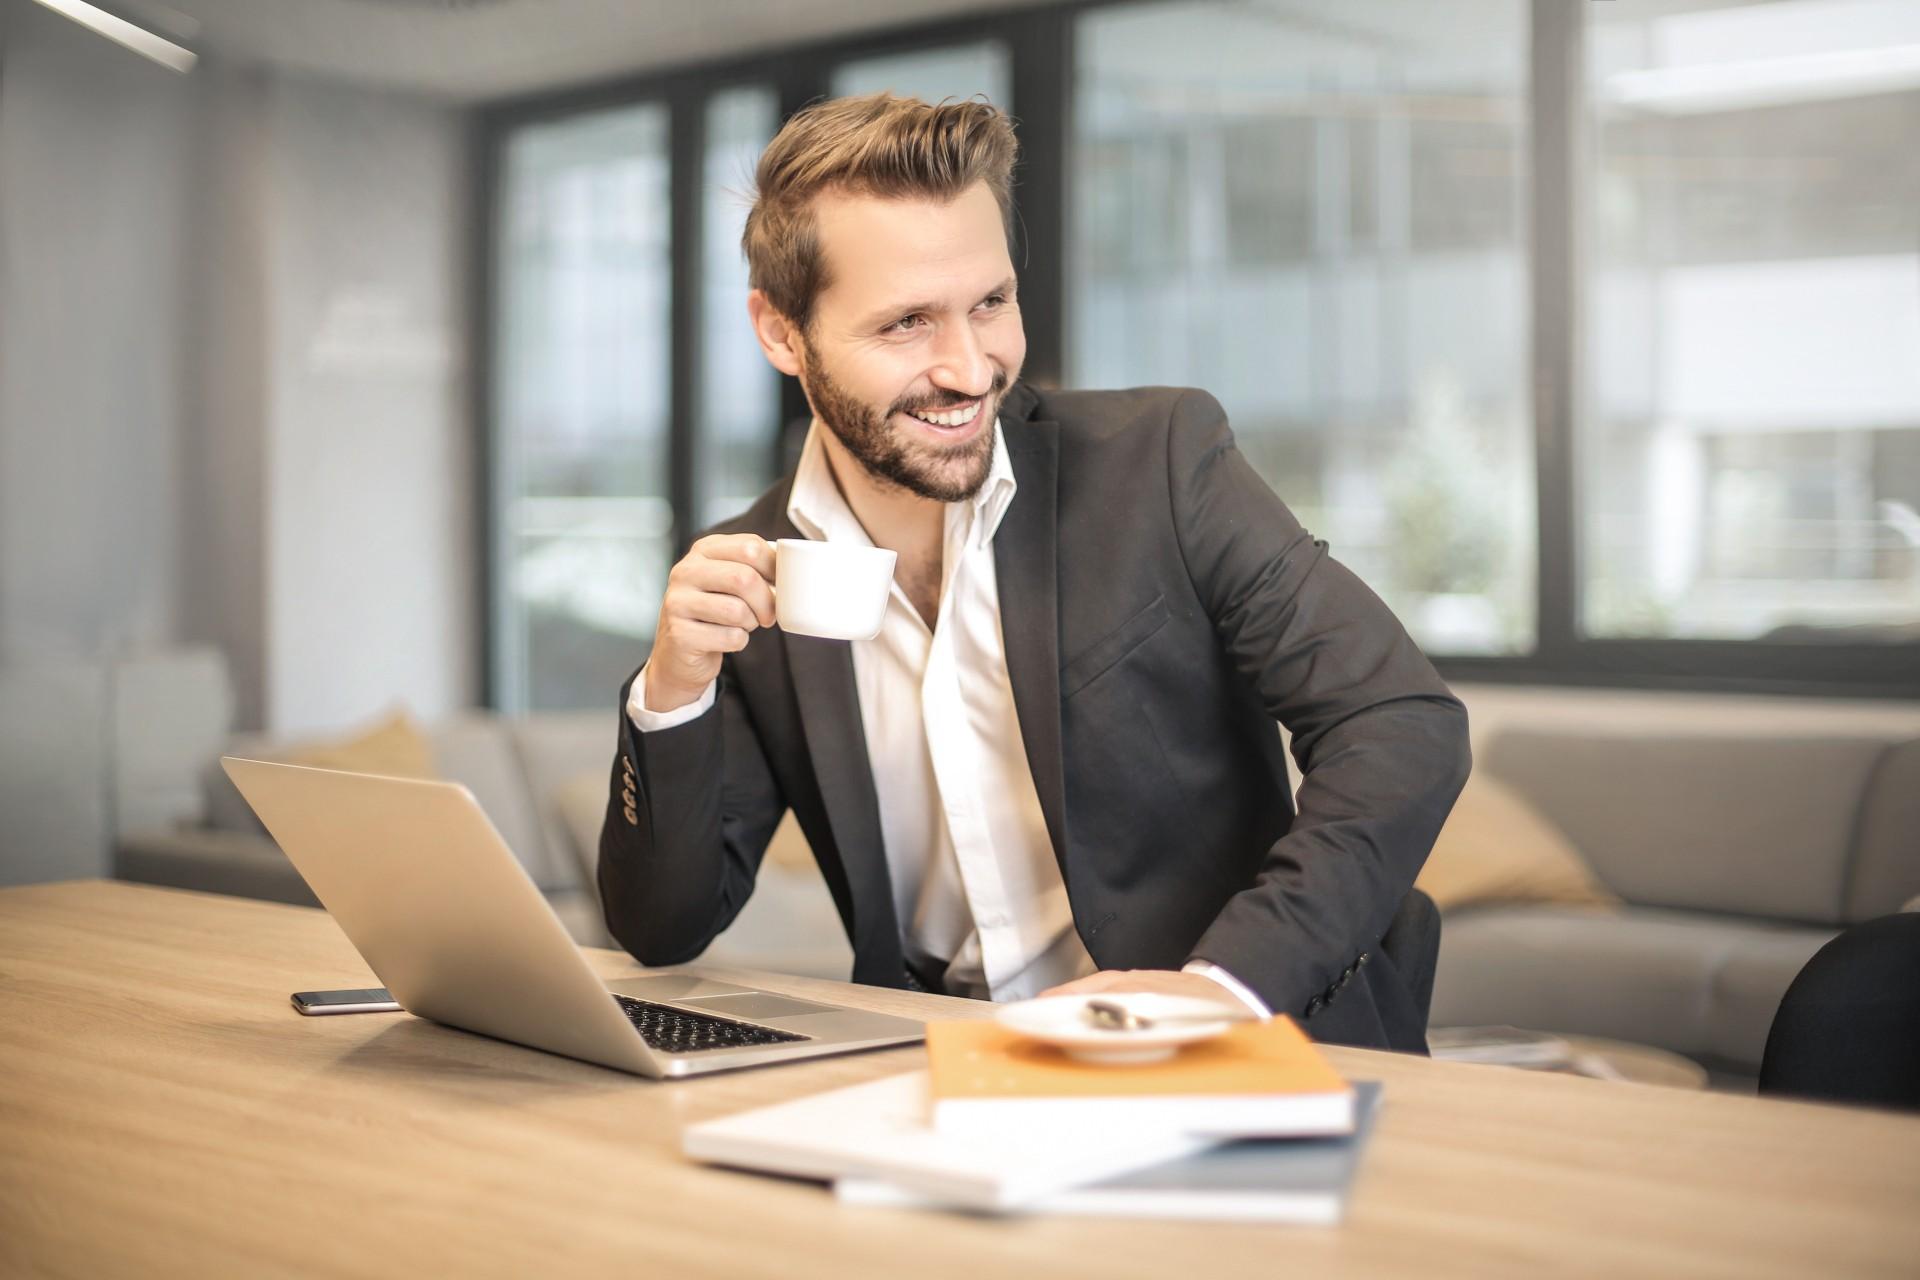 Successful investors share commonalities